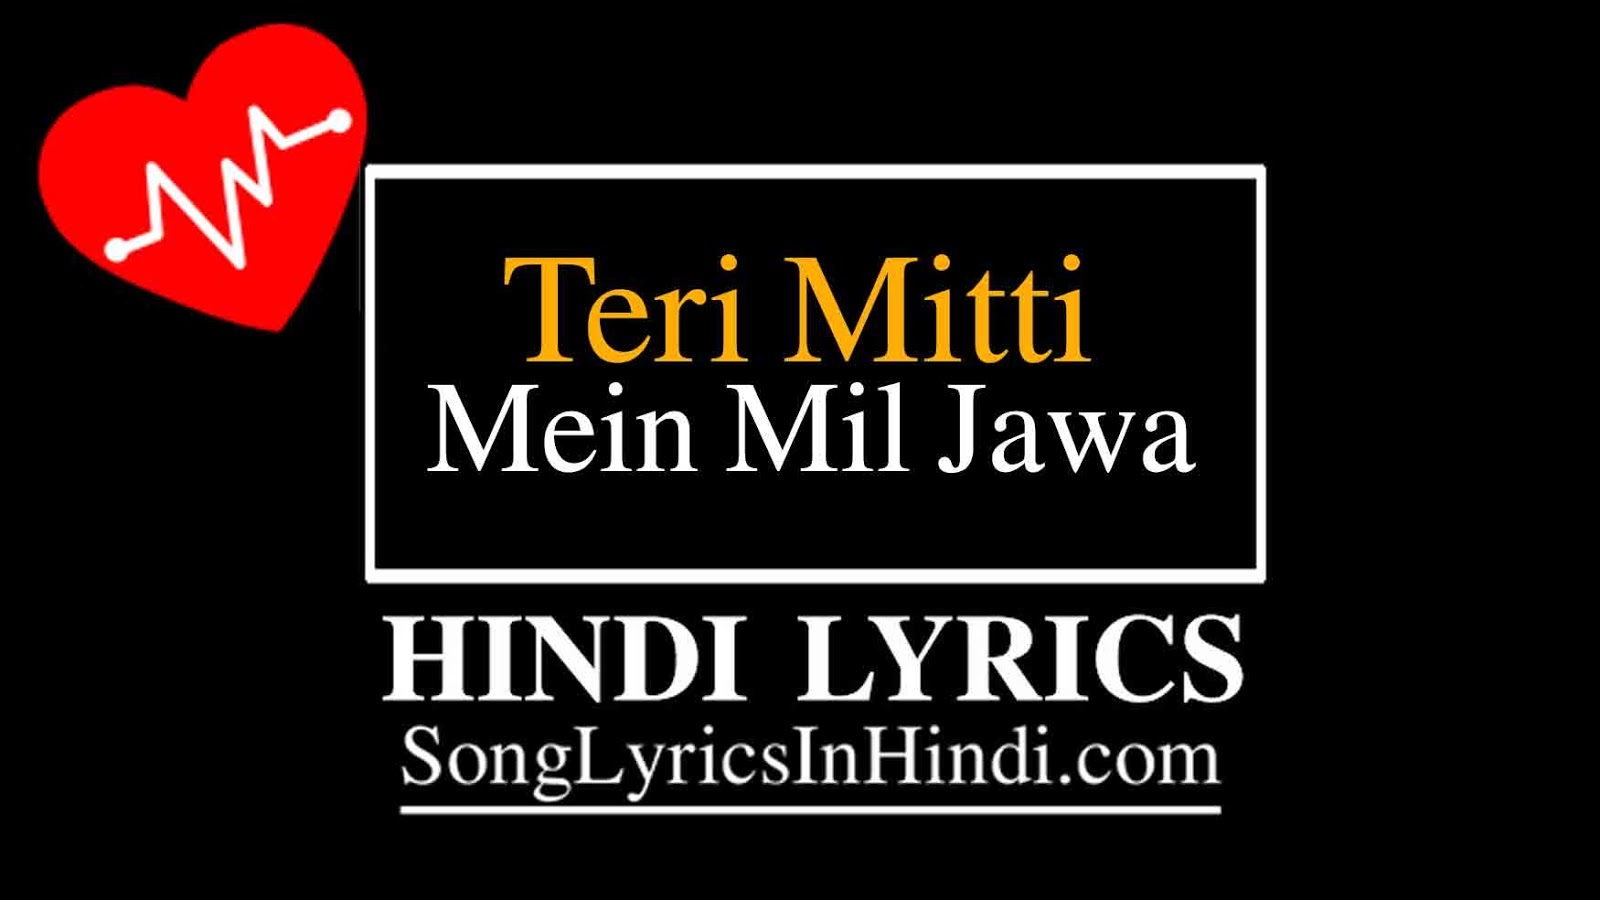 Teri mitti mein mil jawa hindi lyrics - kesari (2019)